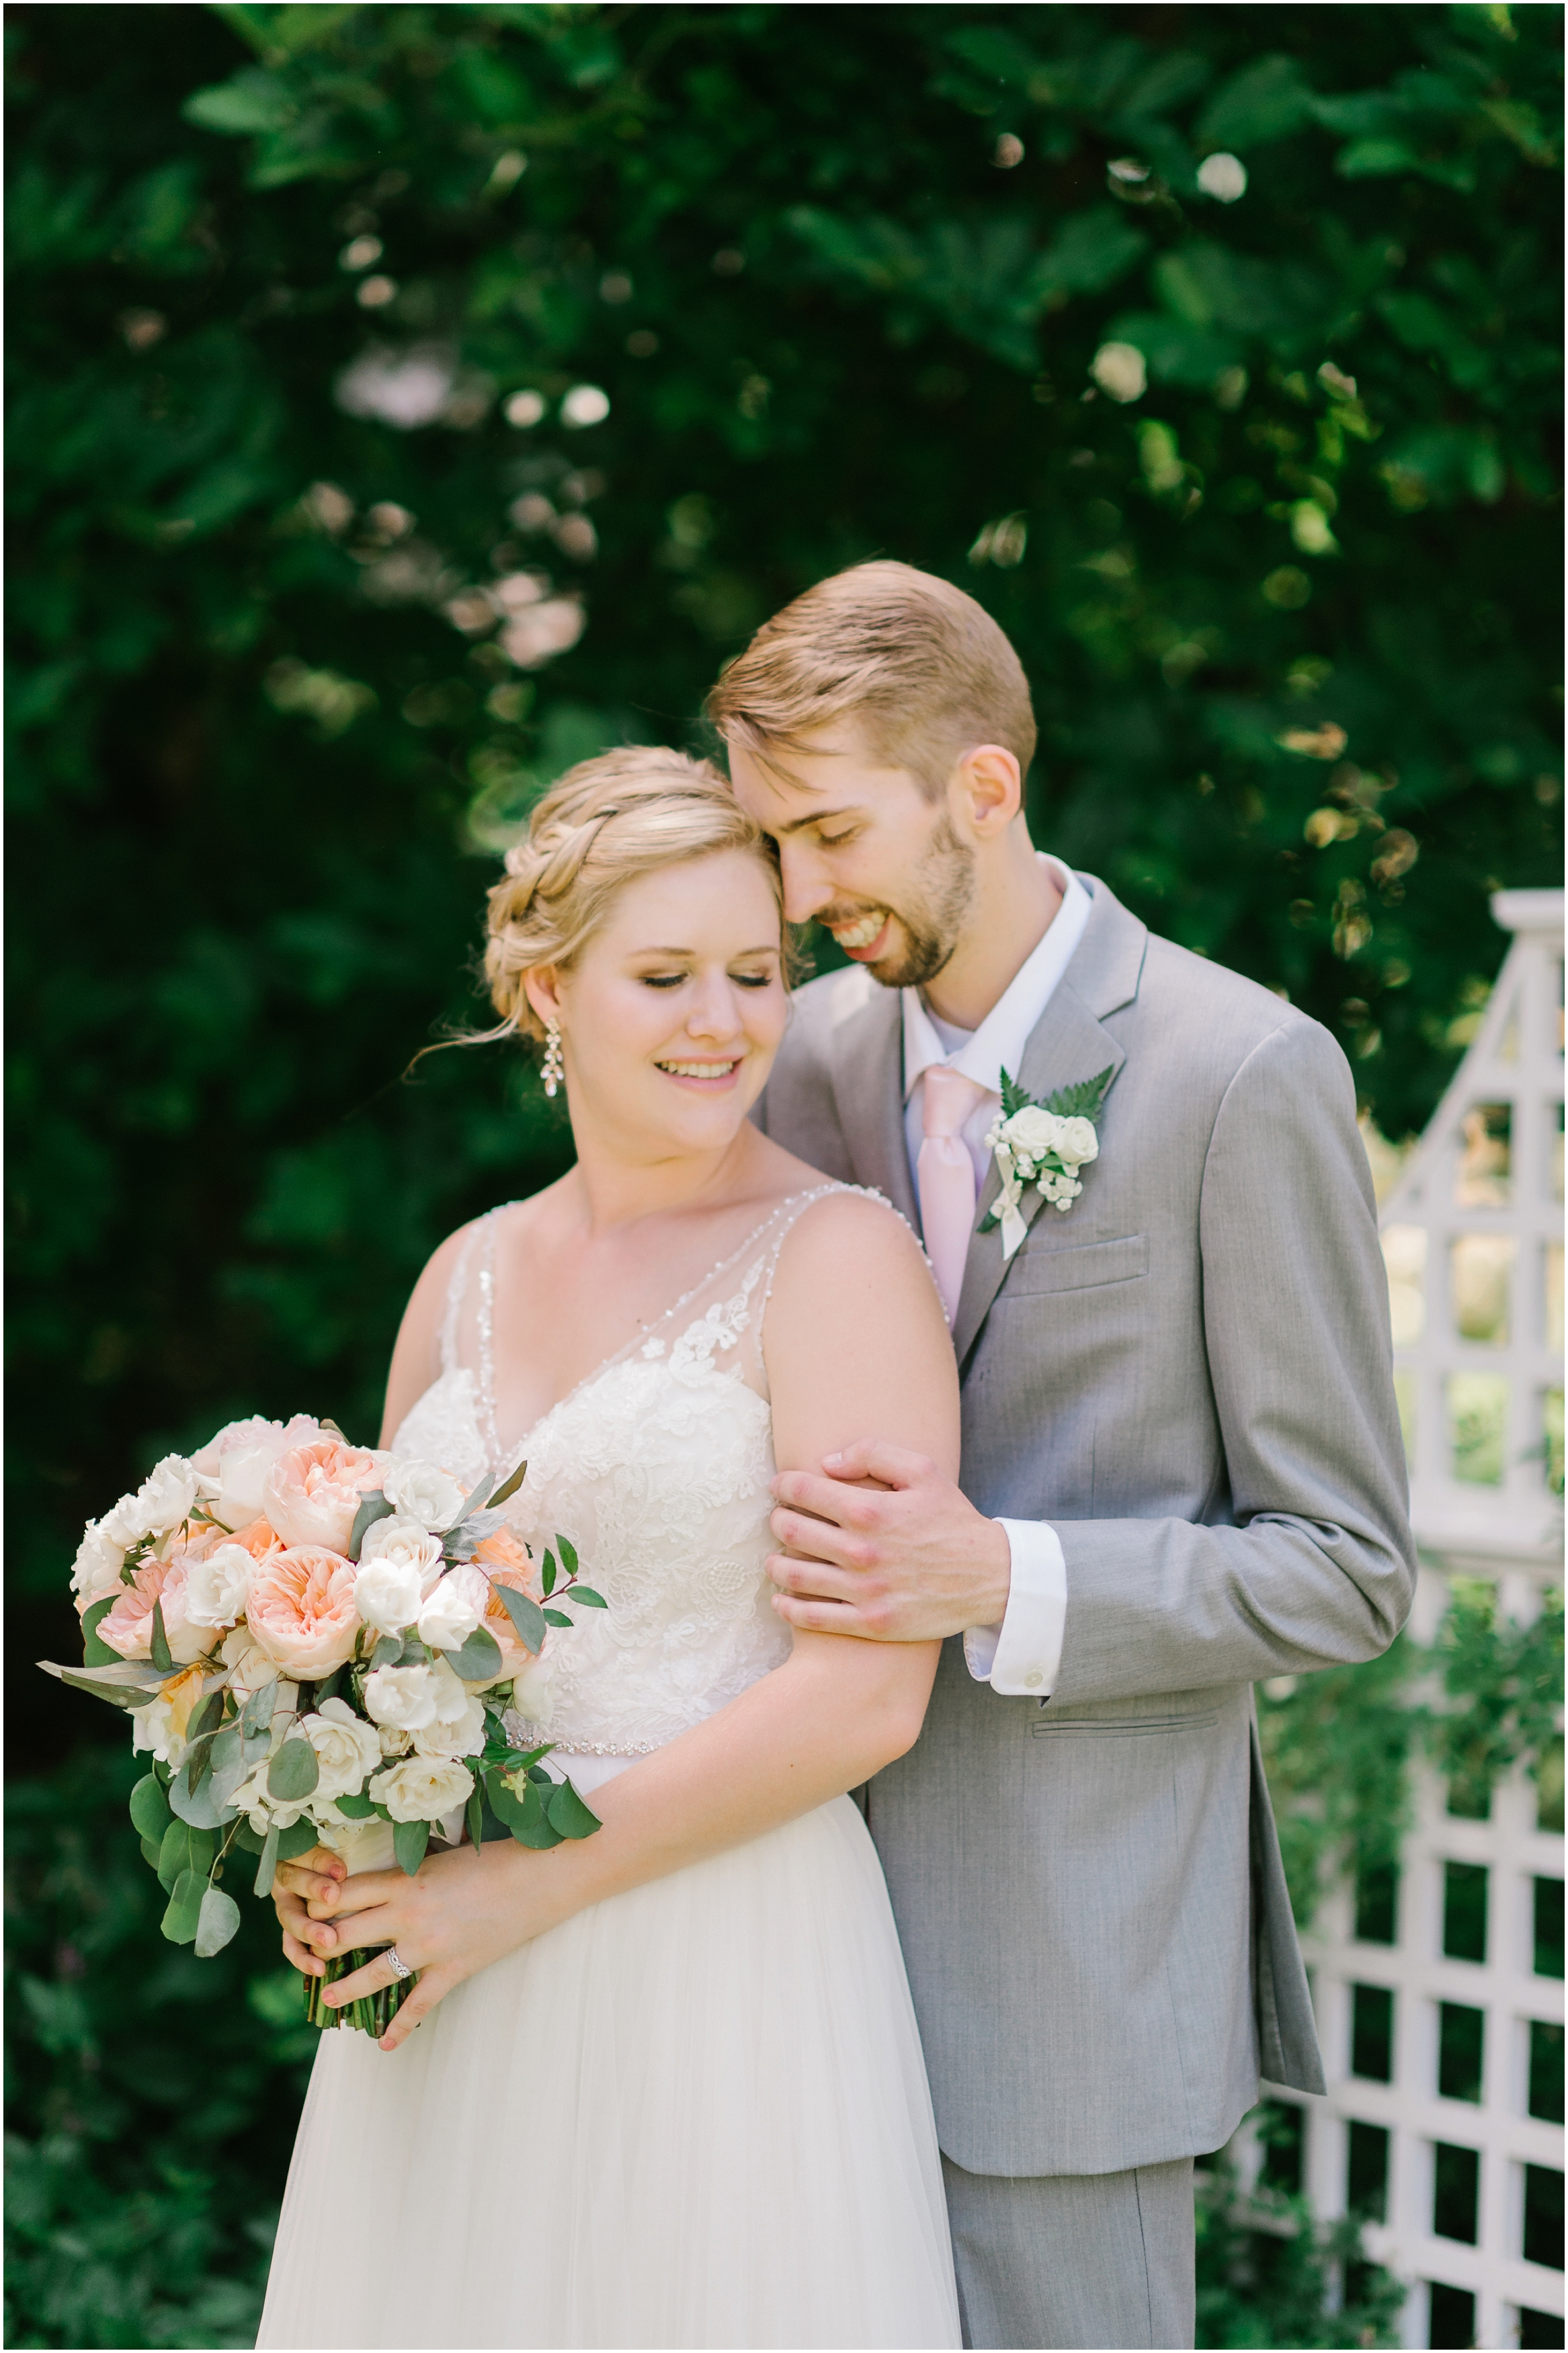 Rebecca_Shehorn_Photography_Indianapolis_Wedding_Photographer_8497.jpg